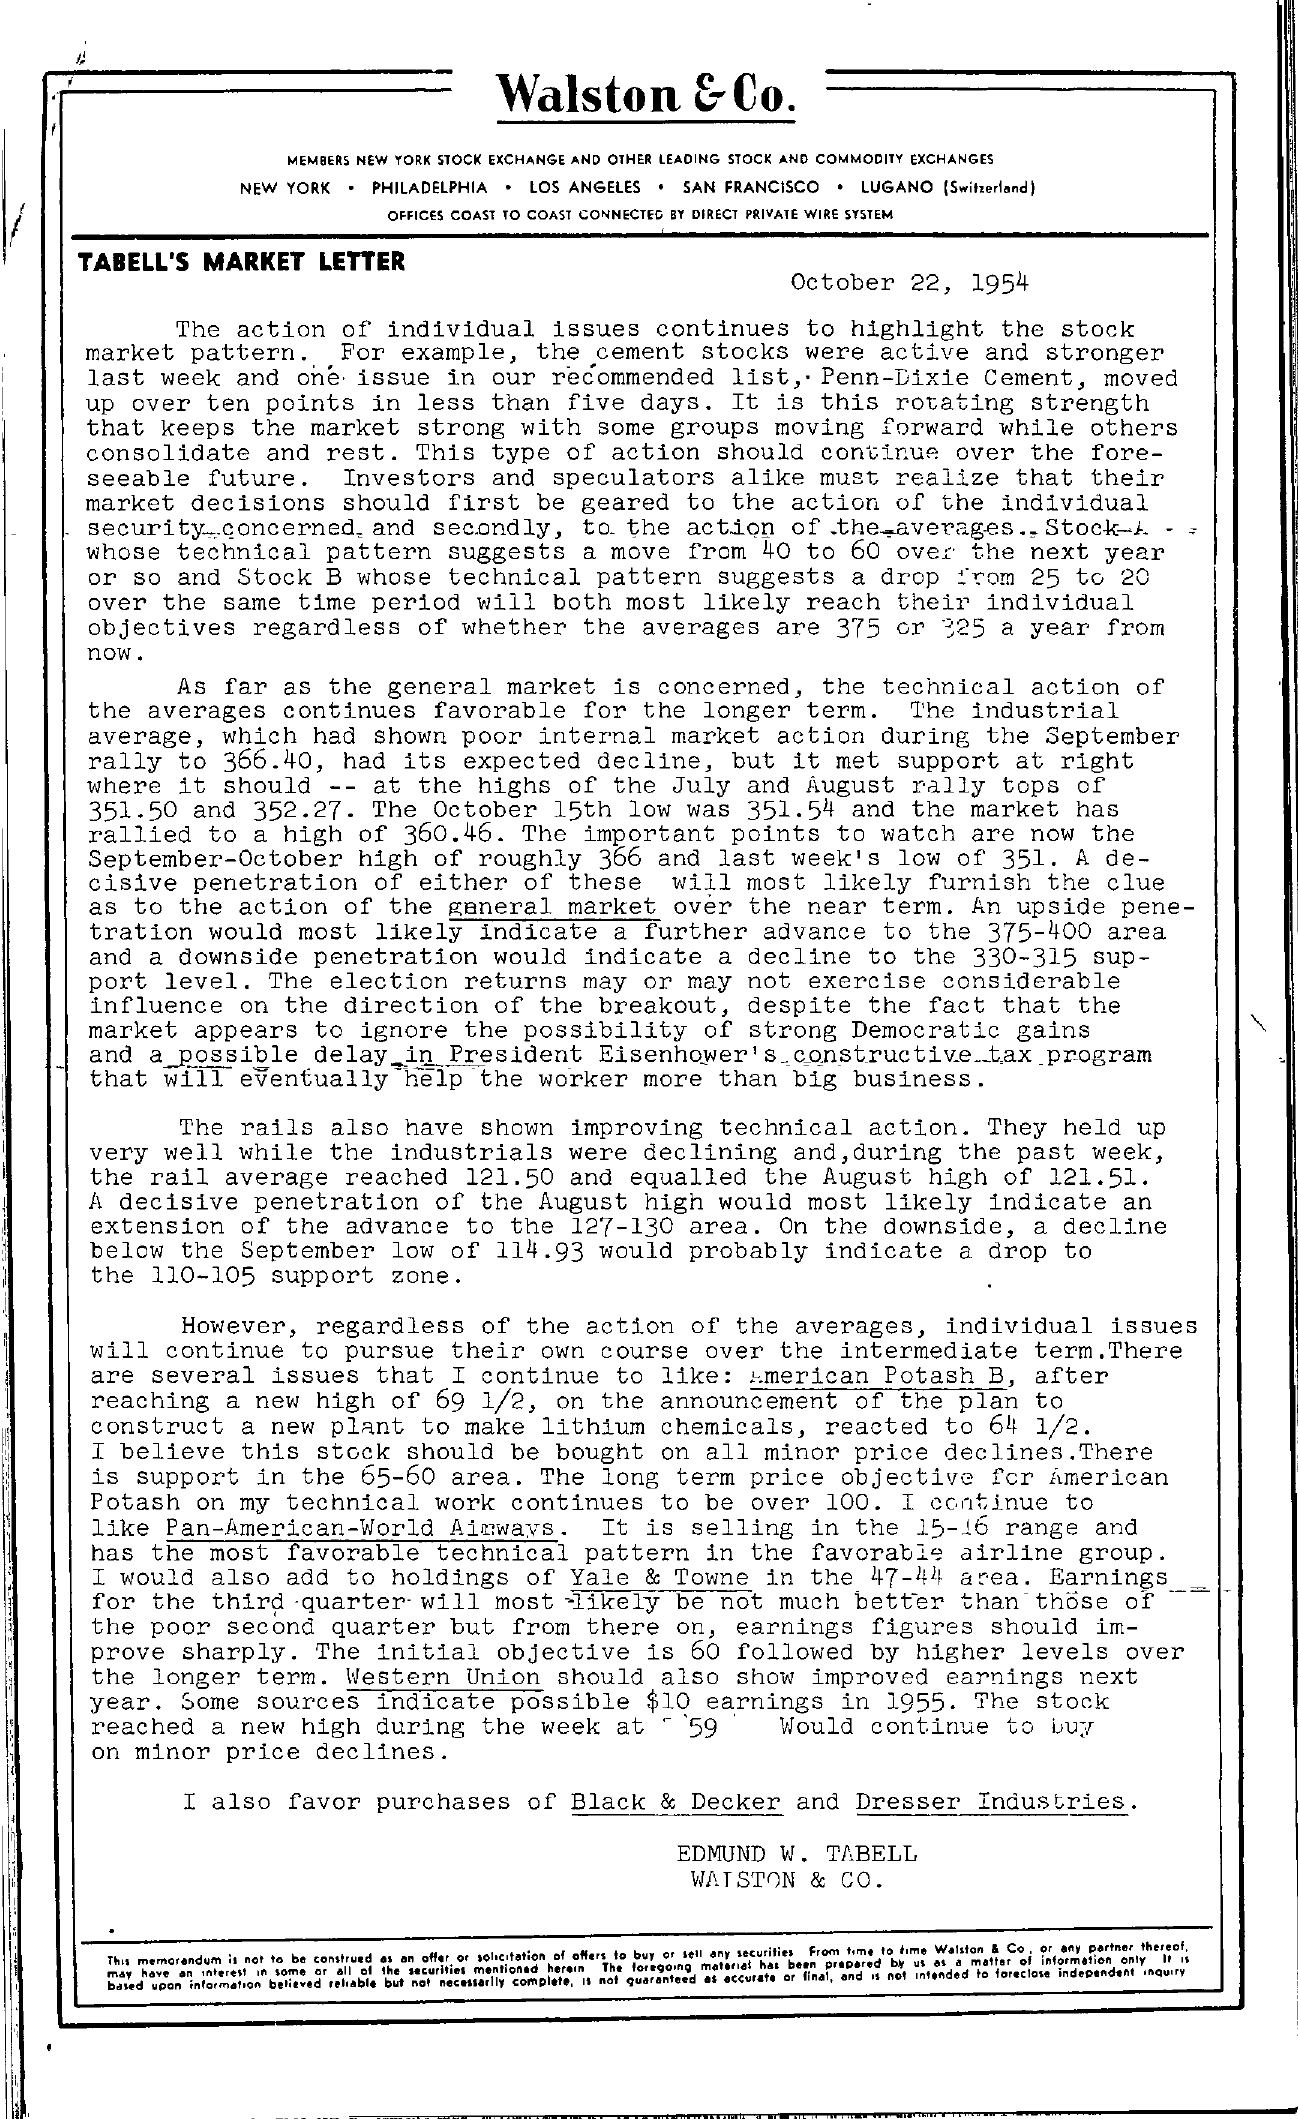 Tabell's Market Letter - October 22, 1954